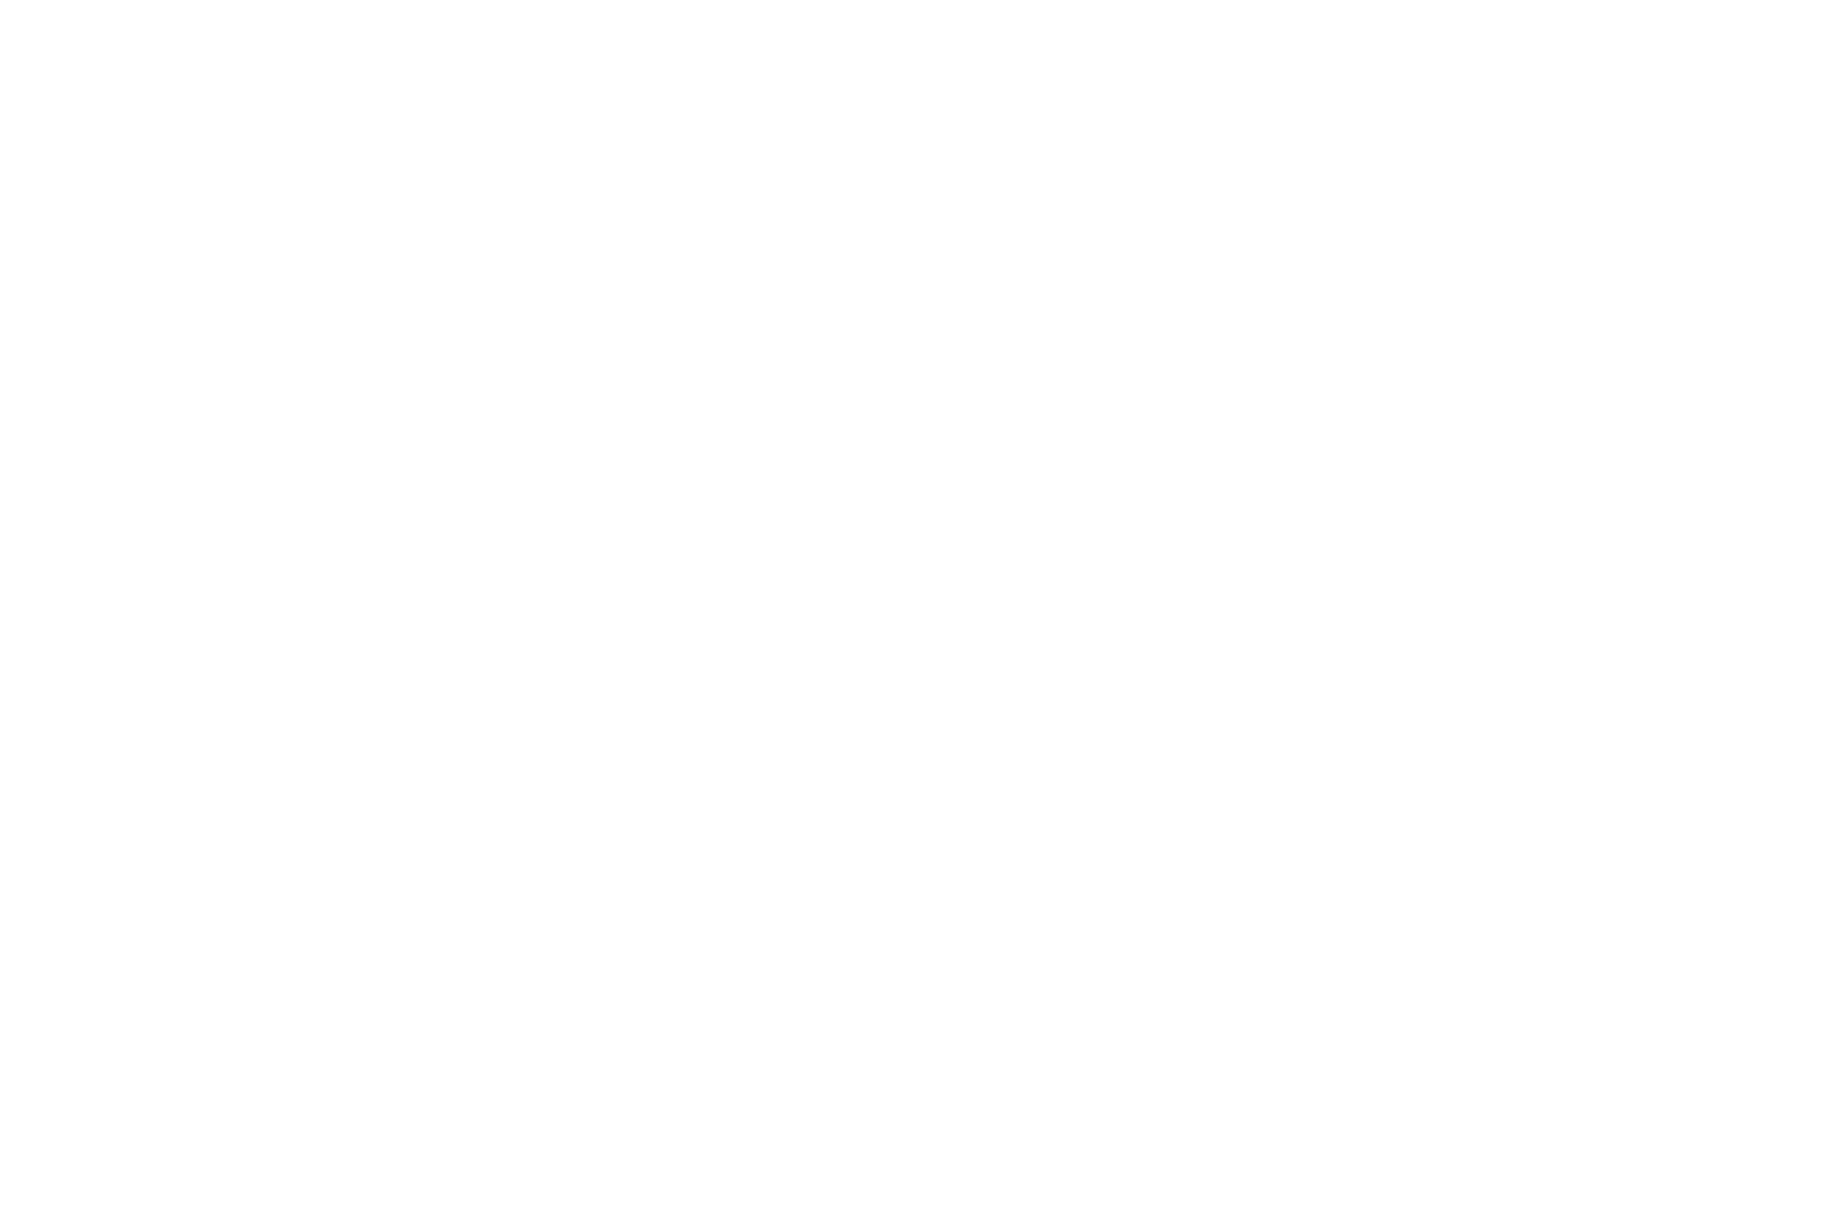 Judge-Orders-Evaluation-In-Britney-Spears